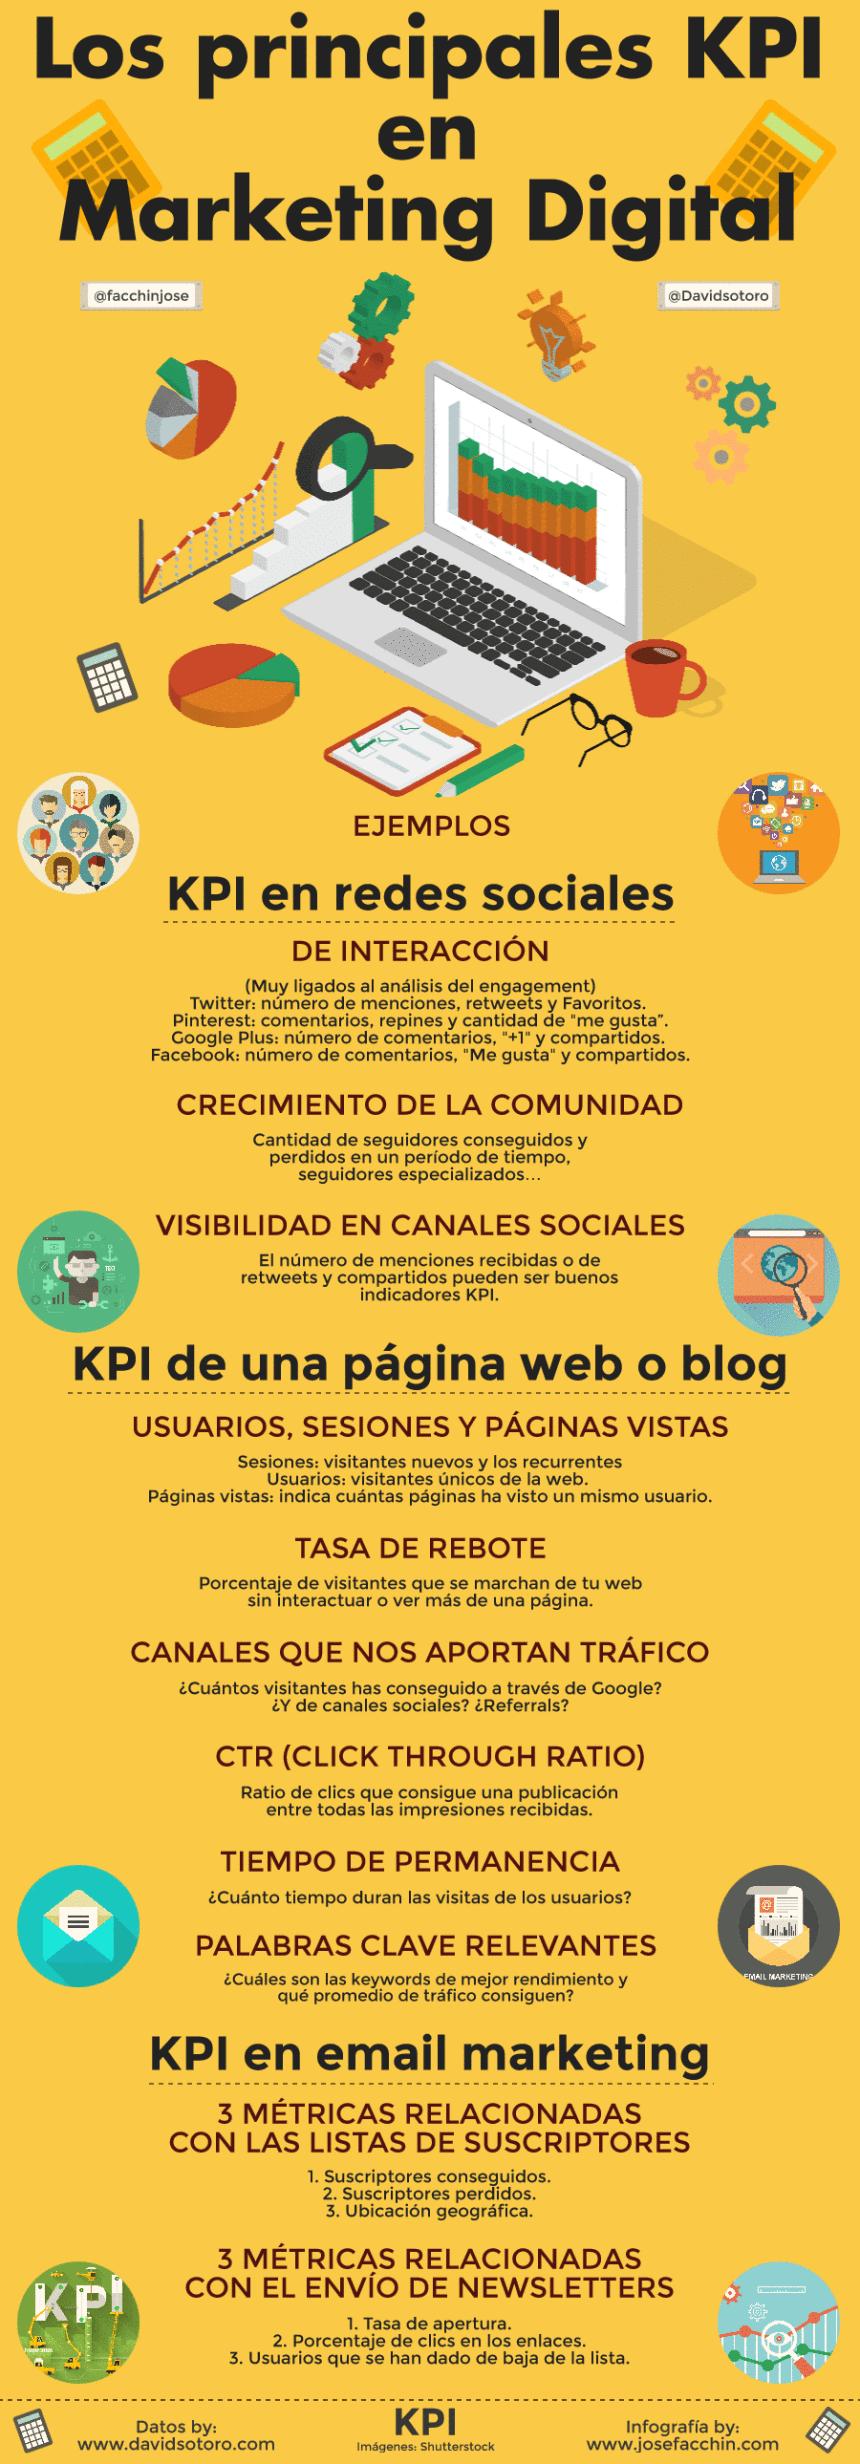 kpi-marketing-digital-infografia